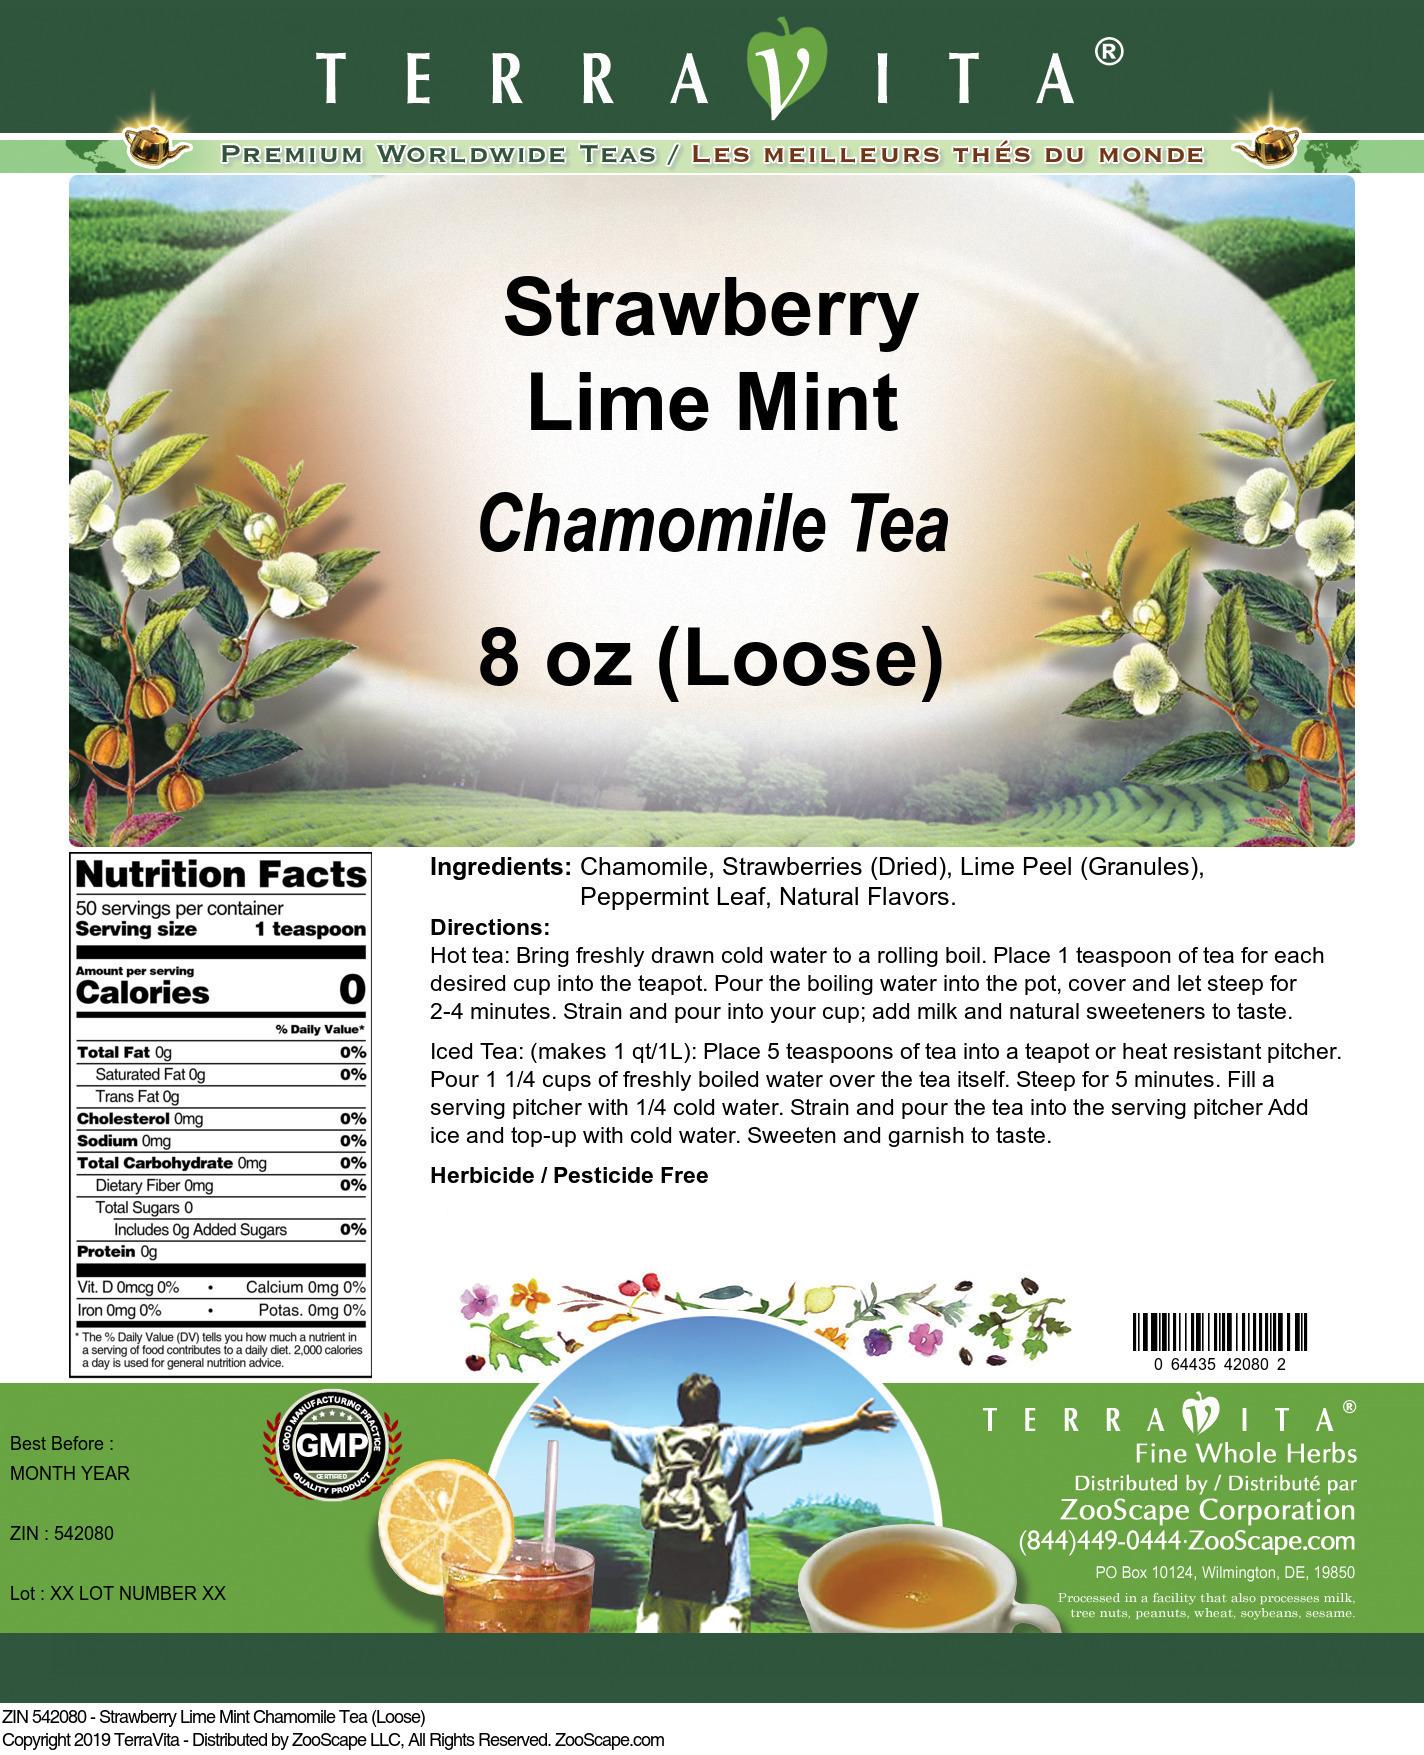 Strawberry Lime Mint Chamomile Tea (Loose)